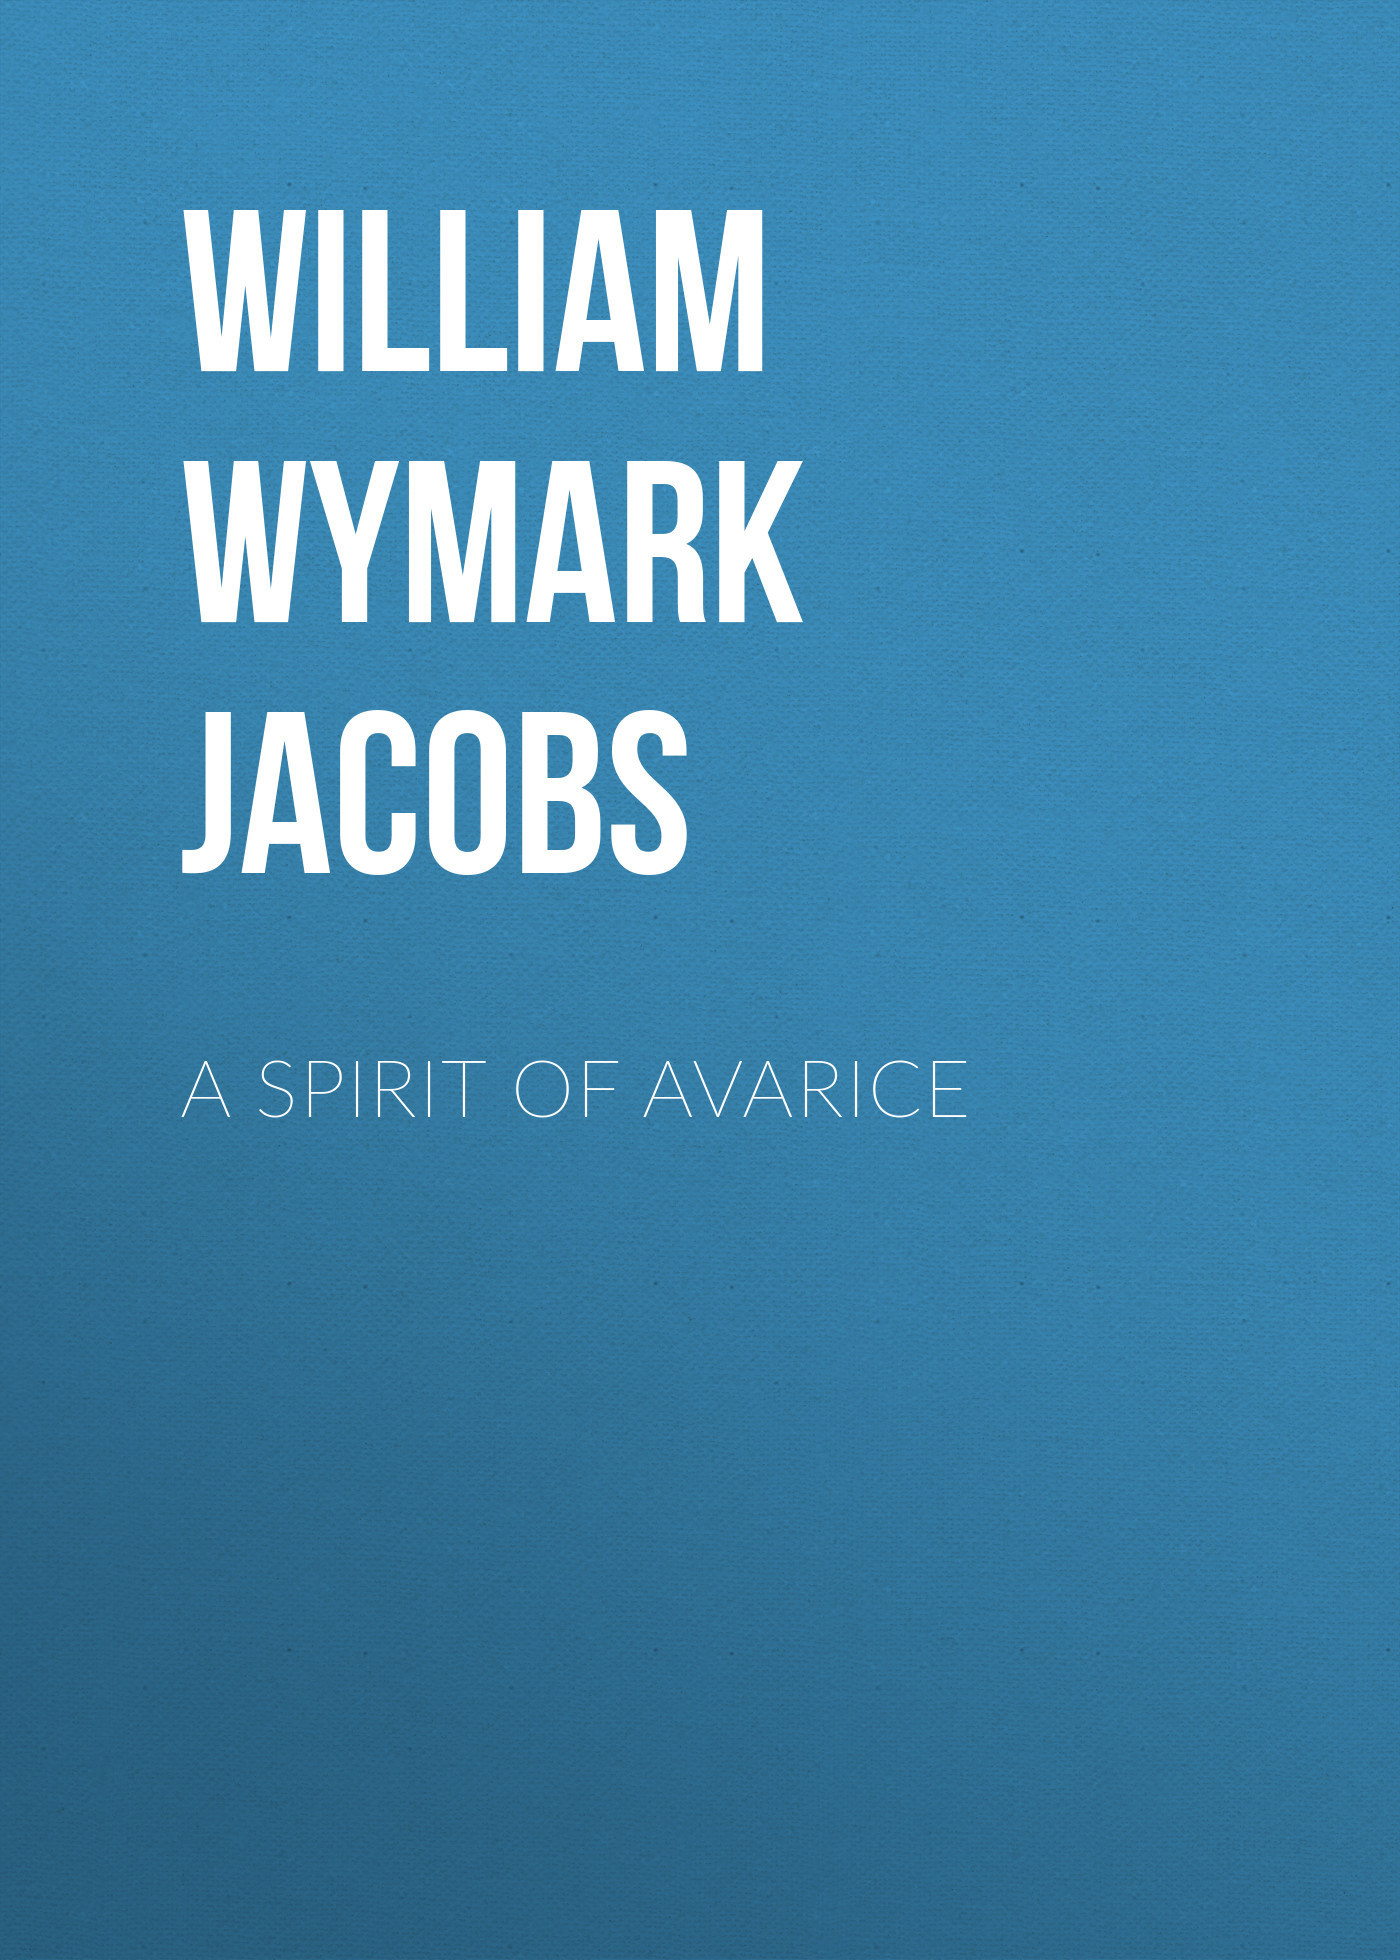 William Wymark Jacobs A Spirit of Avarice william wymark jacobs breaking a spell